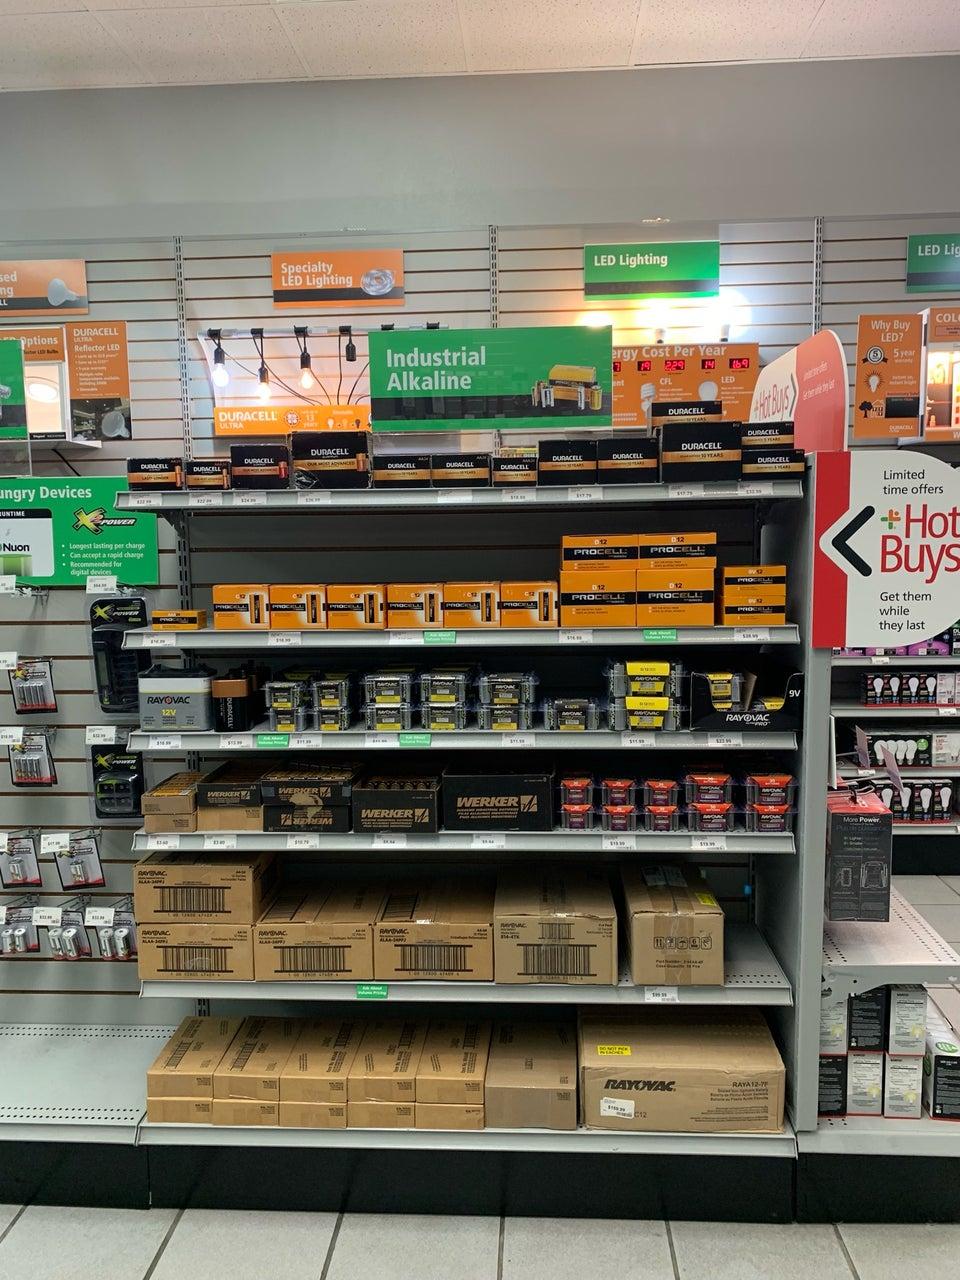 Batteries Plus Bulbs 18541 Hawthorne Blvd, Torrance